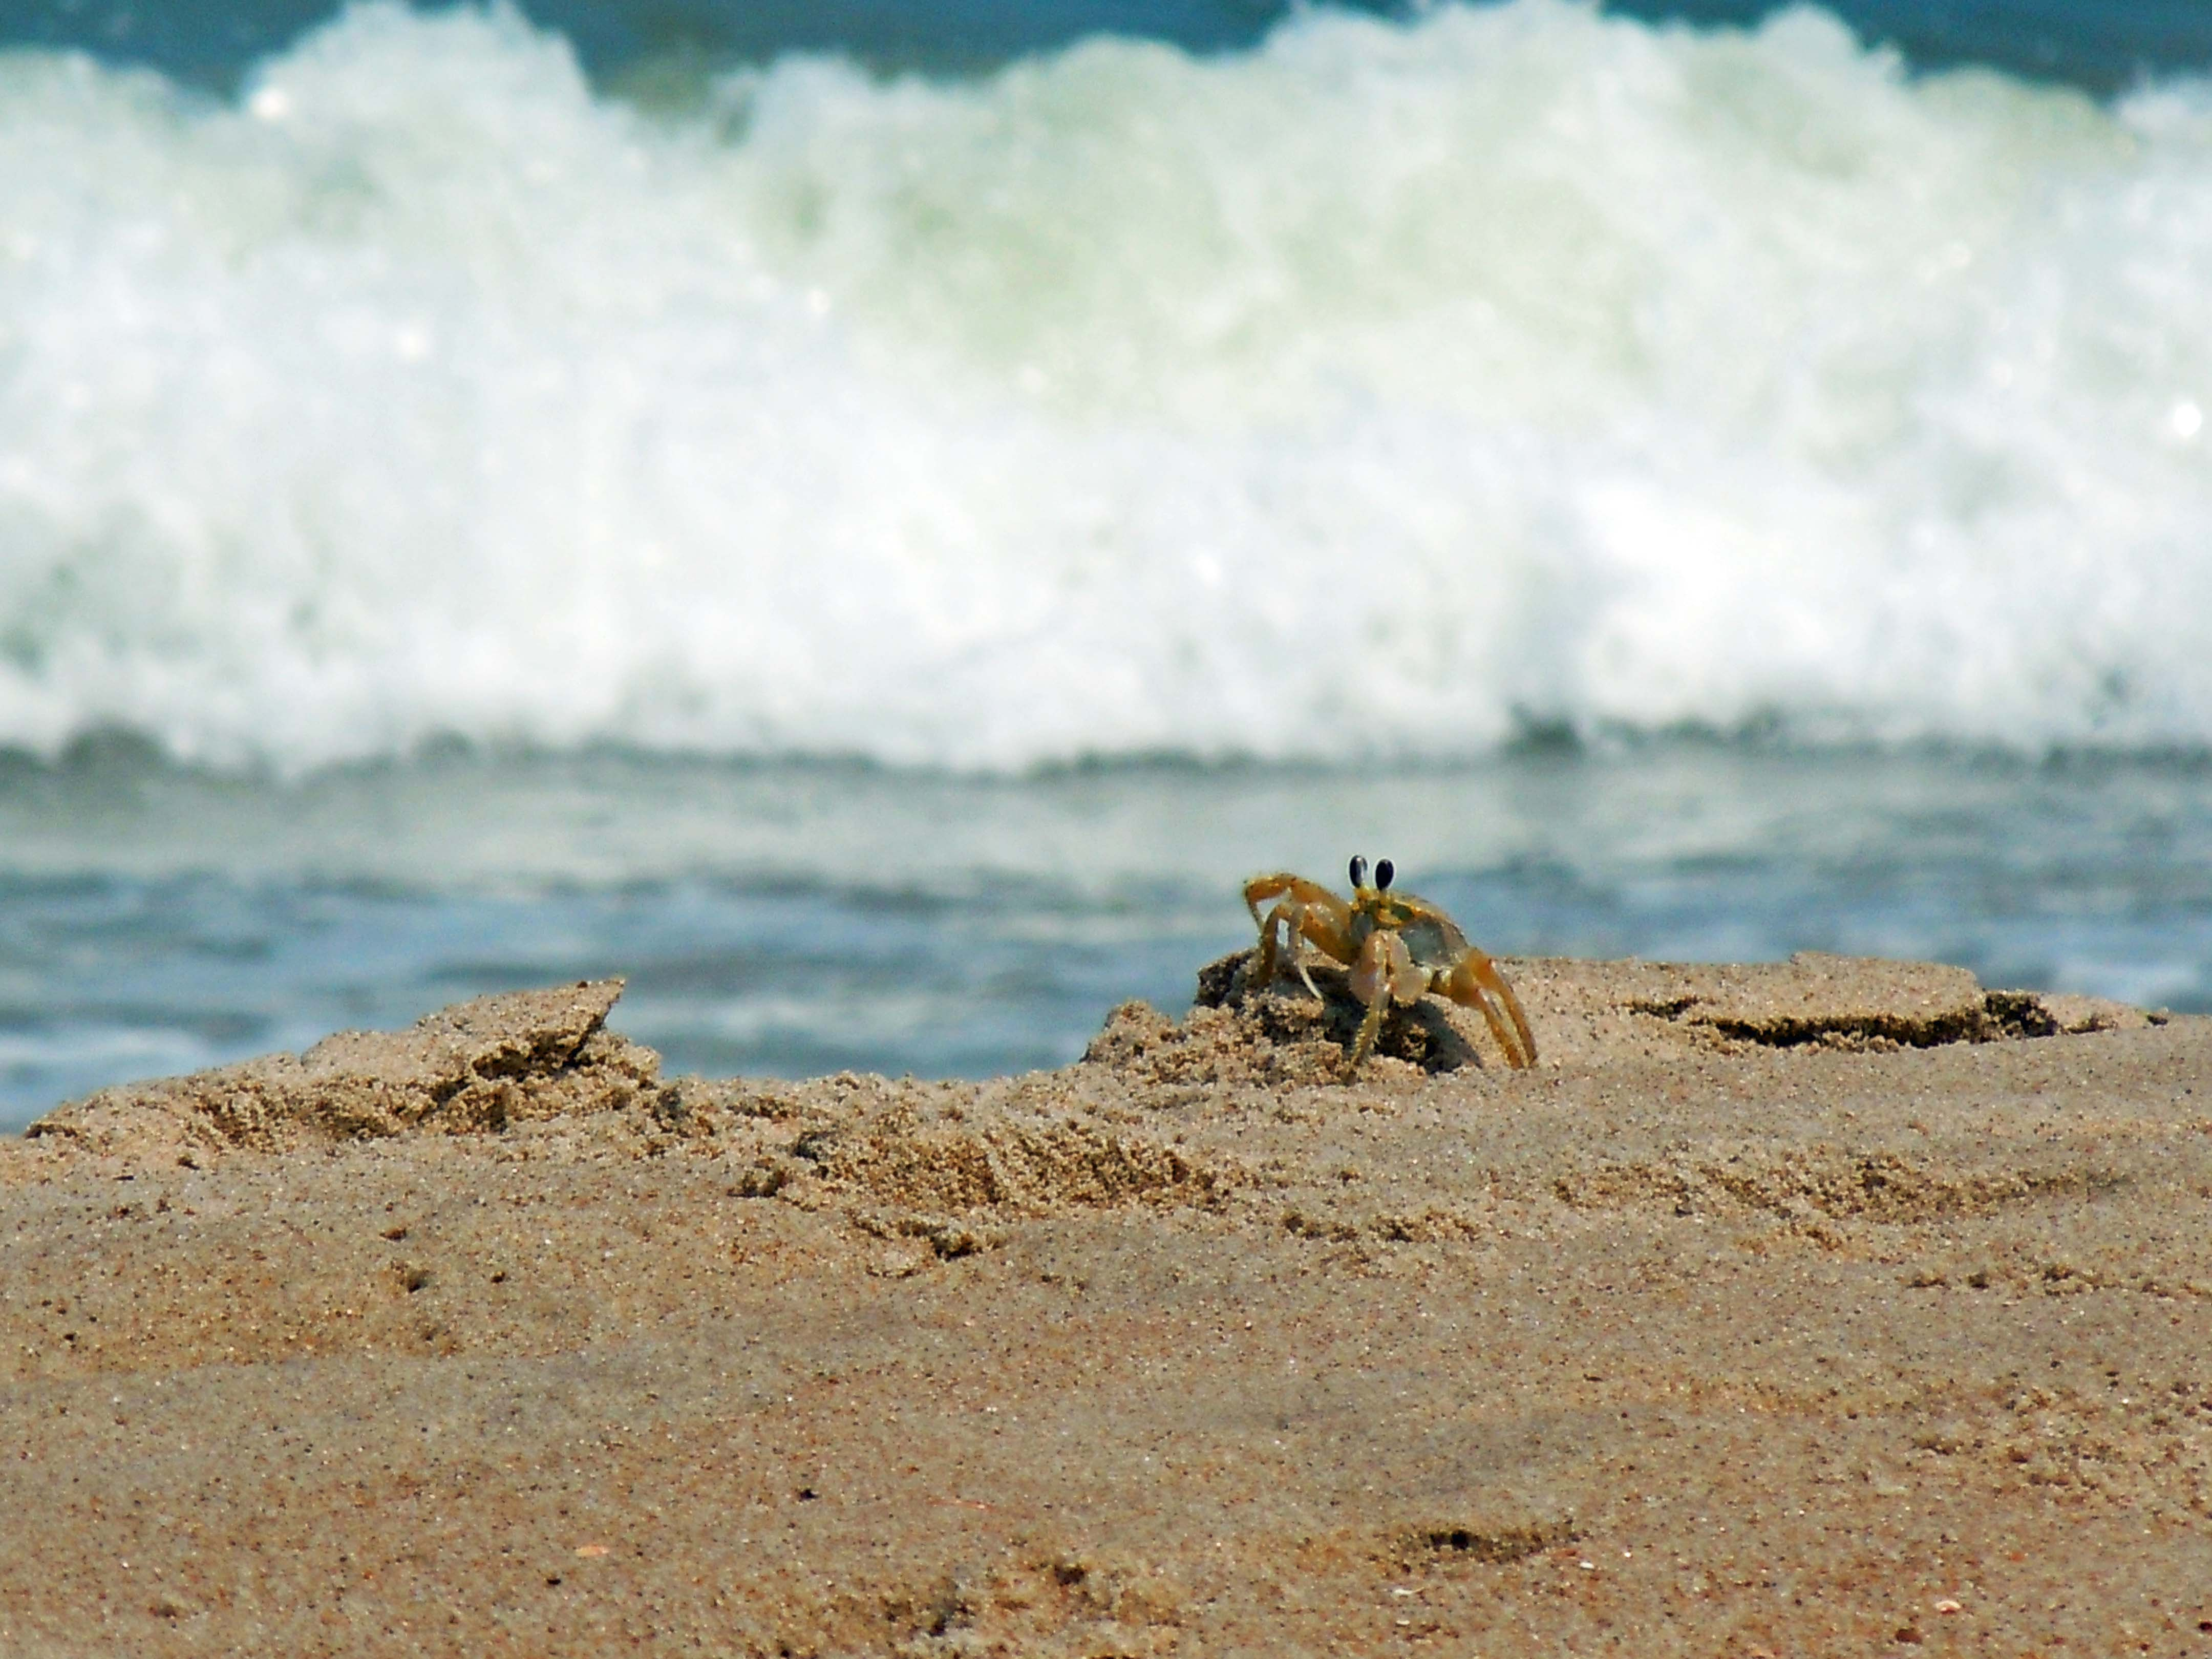 crabatdamneck7_16_10.jpg - Crab at Dam Neck Beach